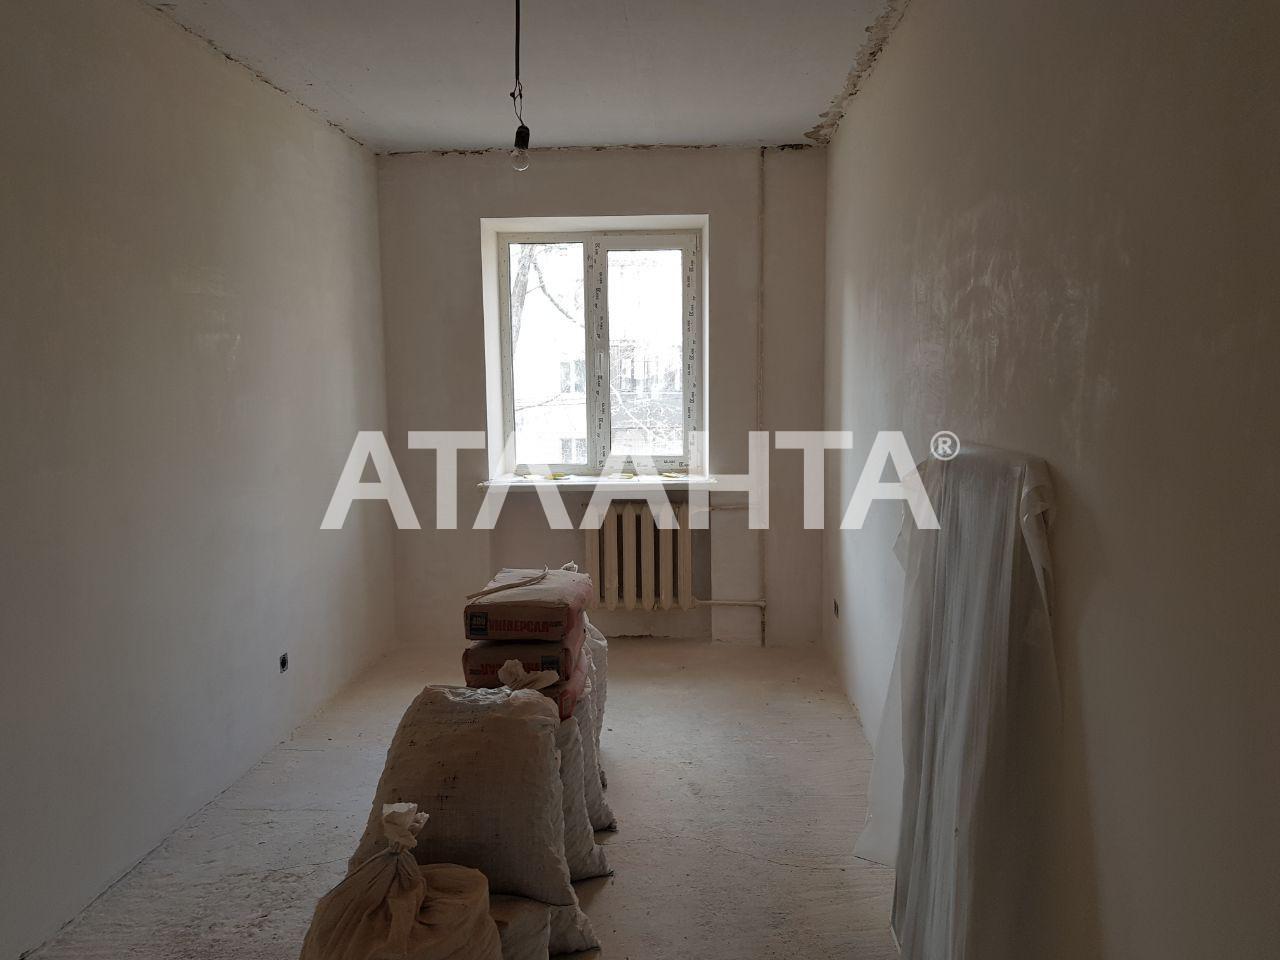 Продается 3-комнатная Квартира на ул. Ивана И Юрия Липы (Гайдара) — 39 900 у.е.